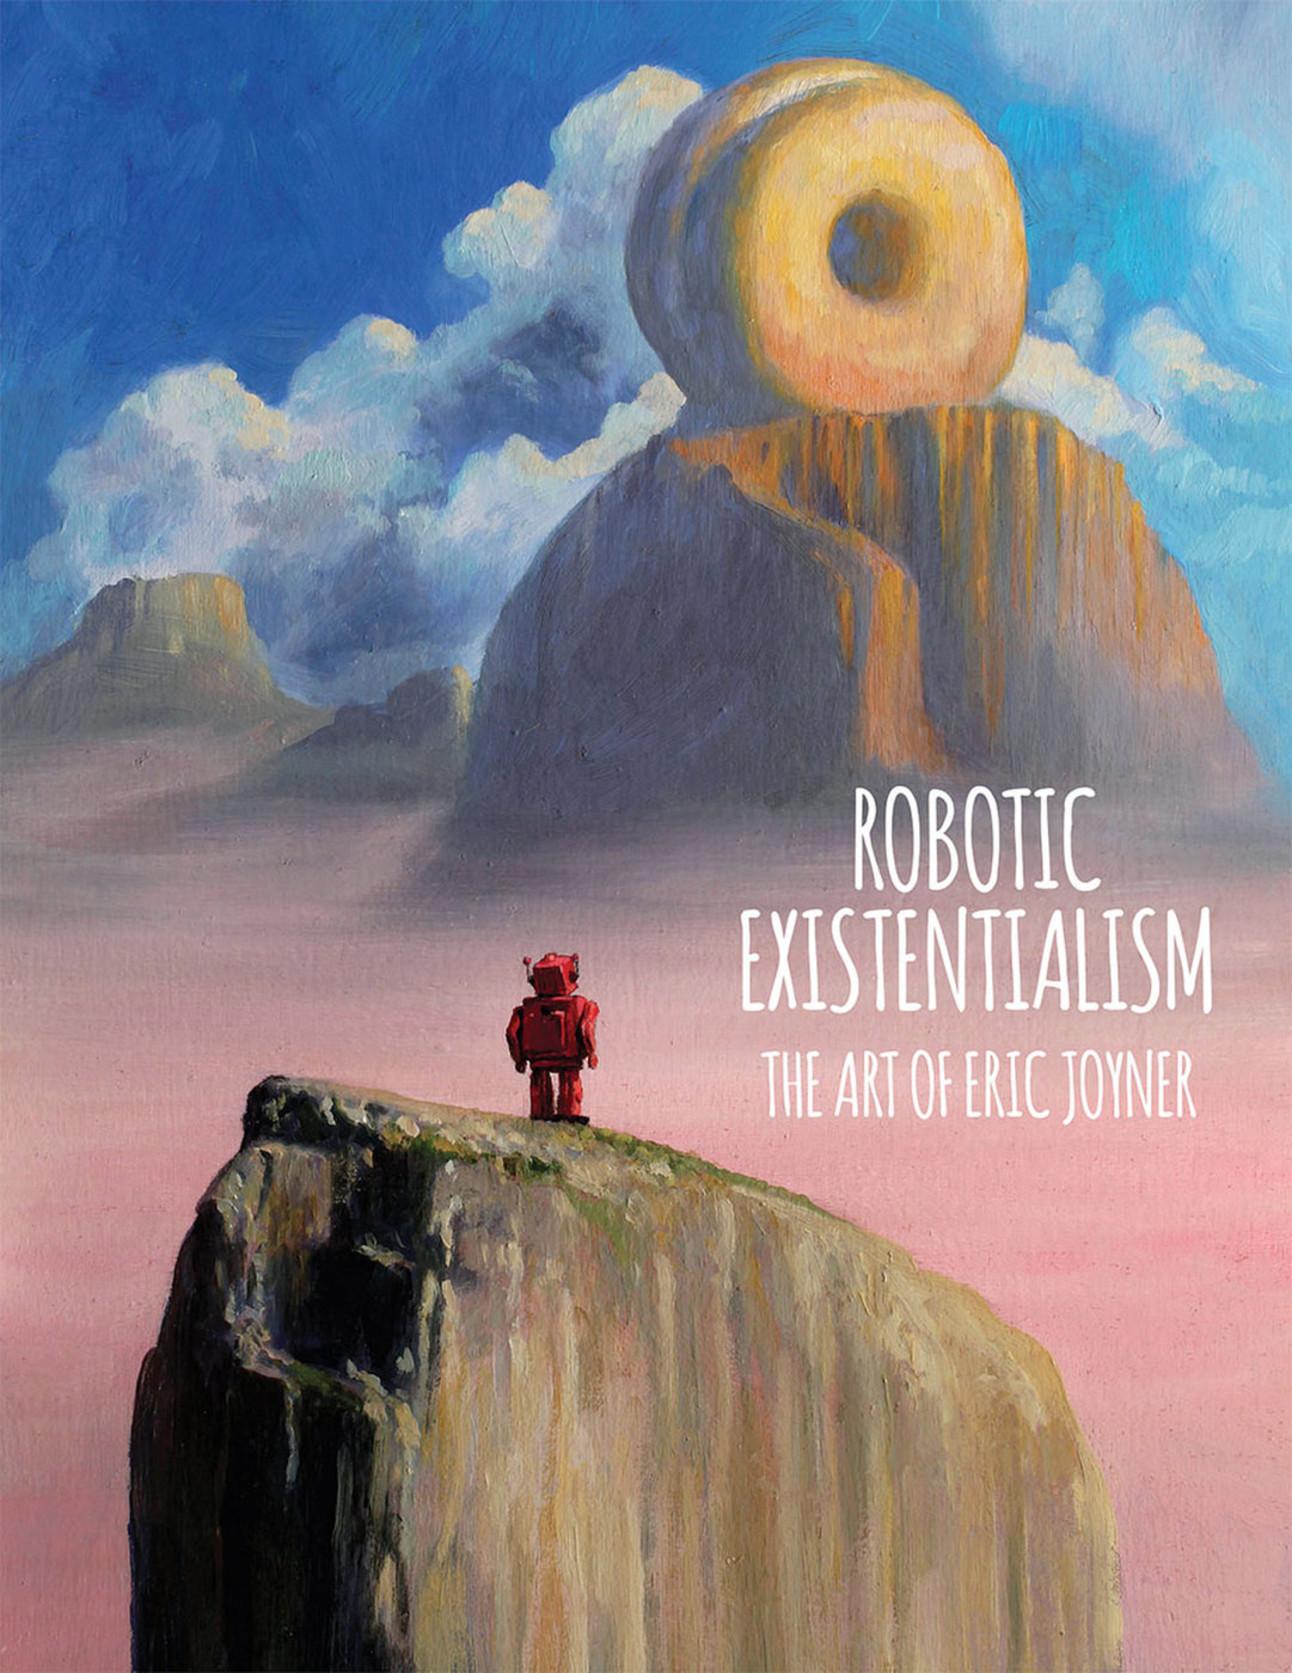 robot_existentialism_artofericjoyner_hc.jpeg